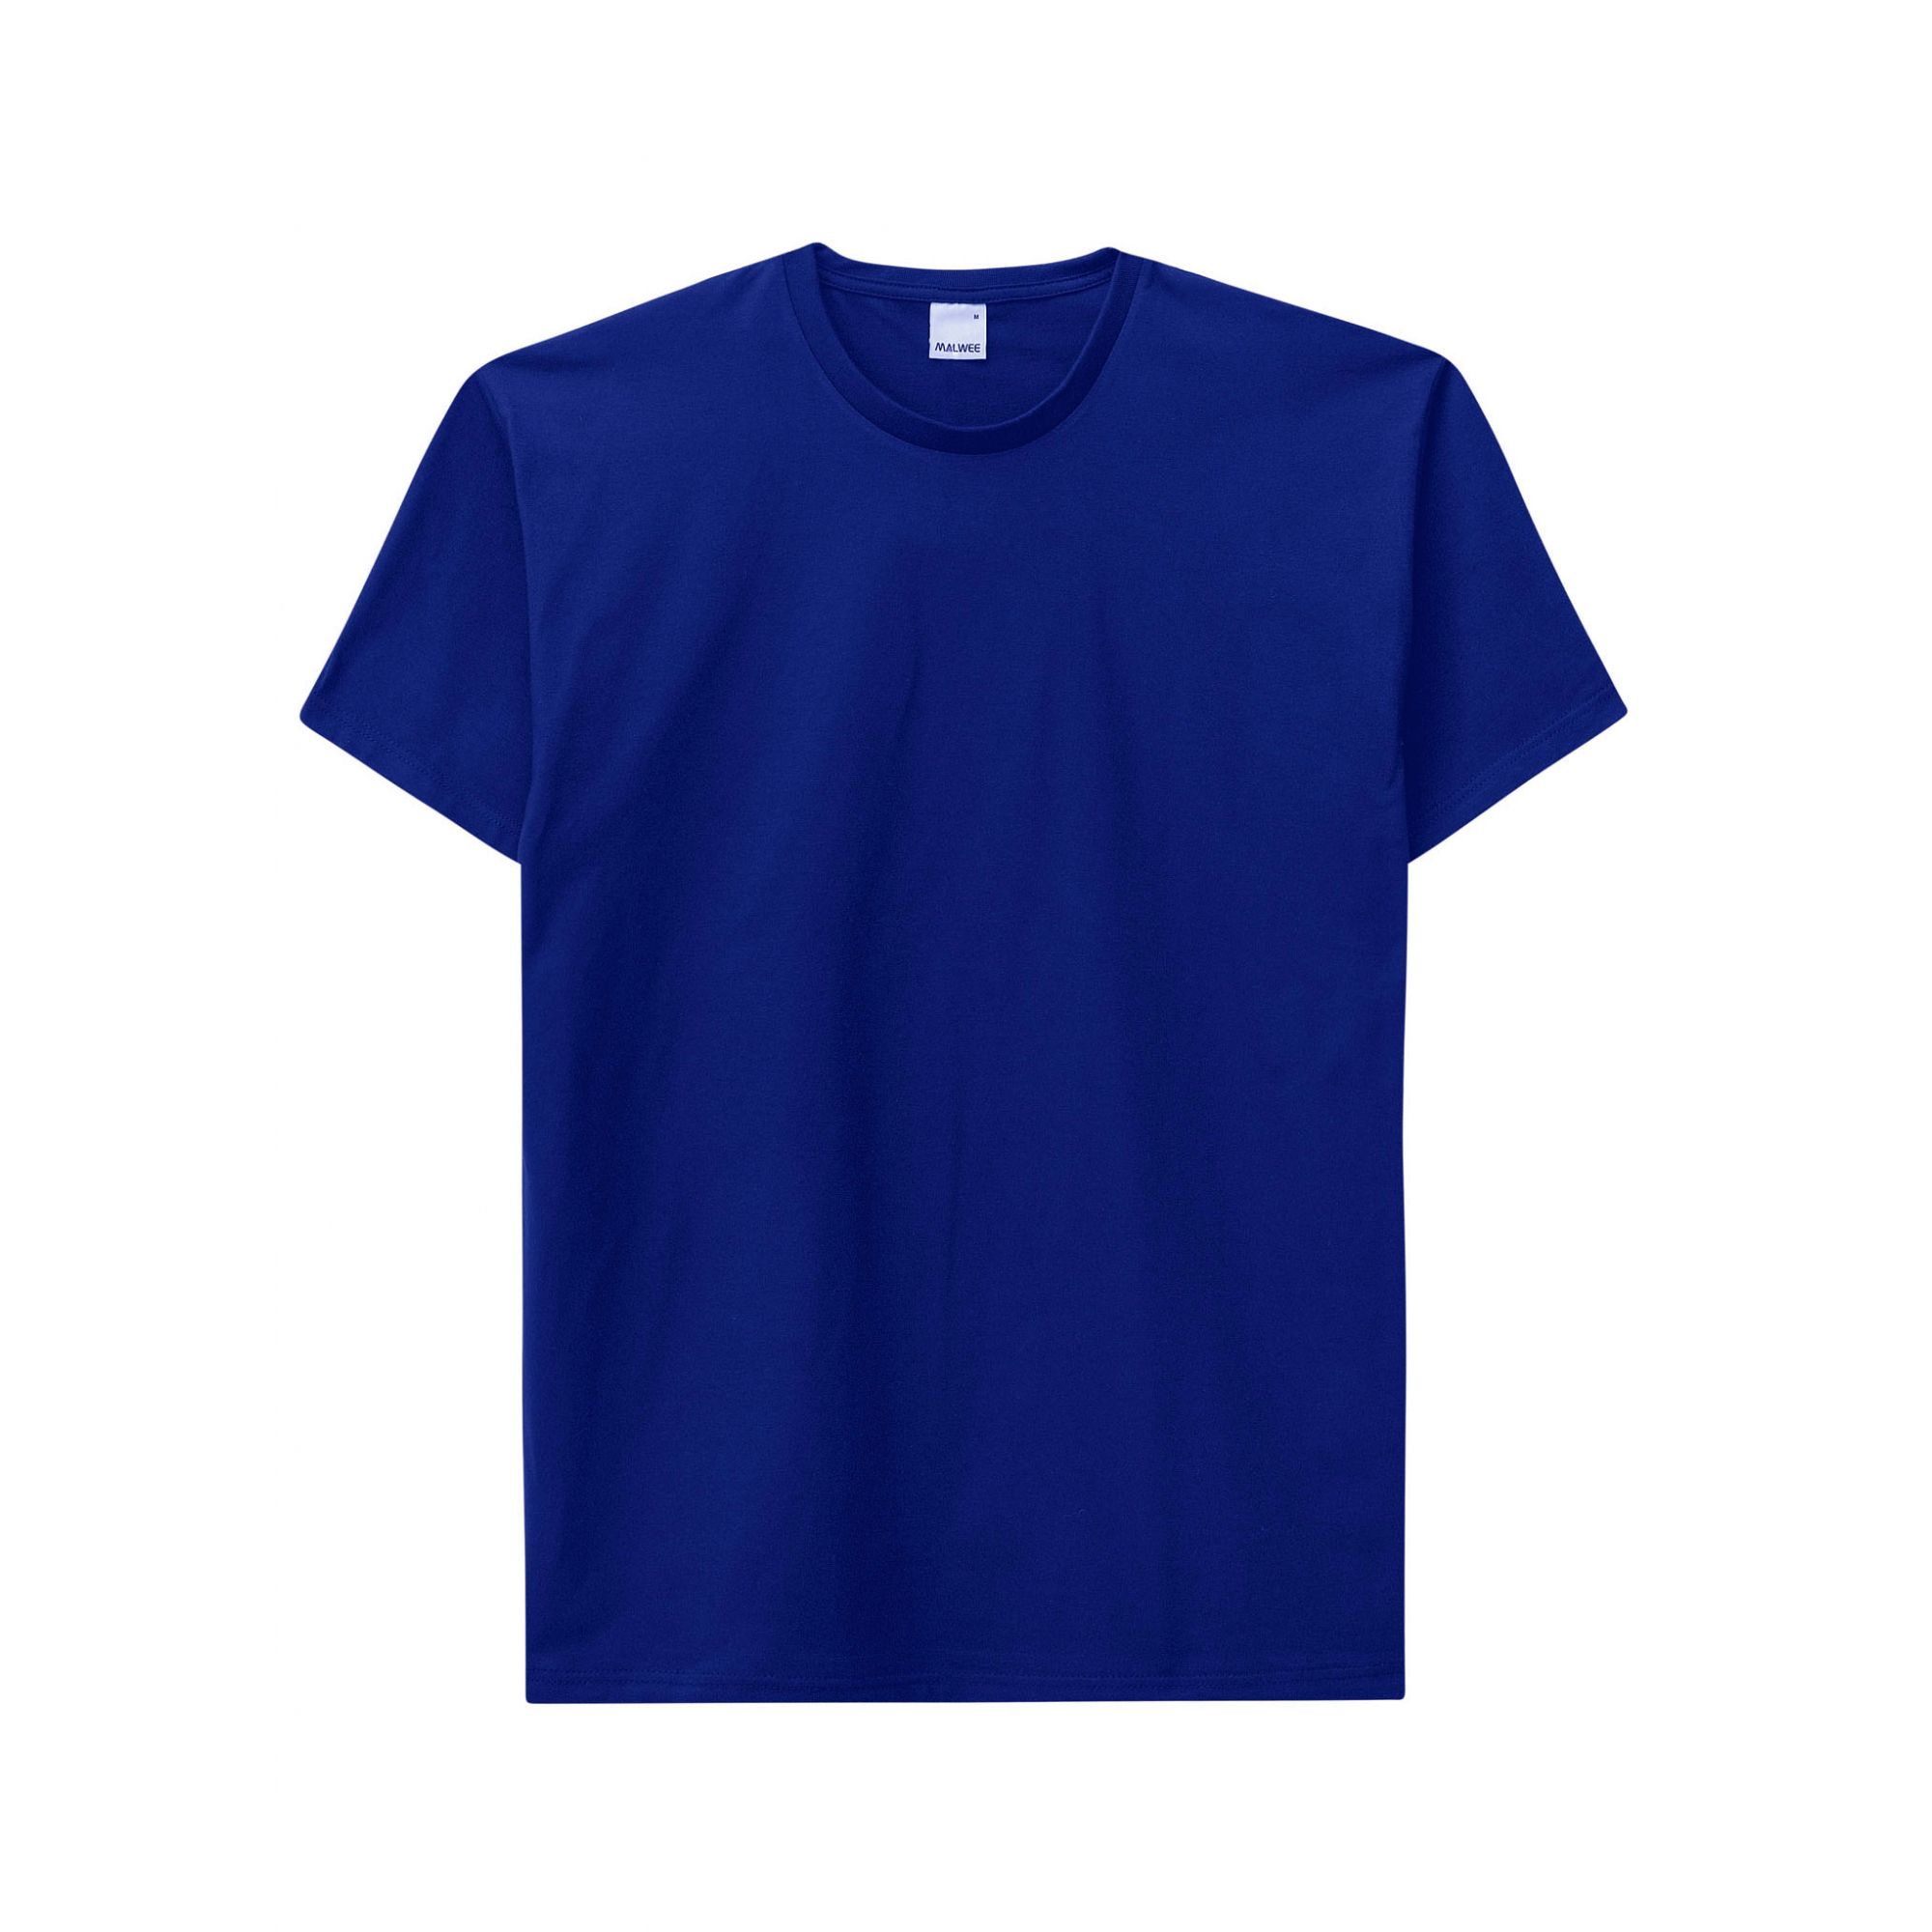 Camiseta ADULTO Masculina Verão Azul Malwee